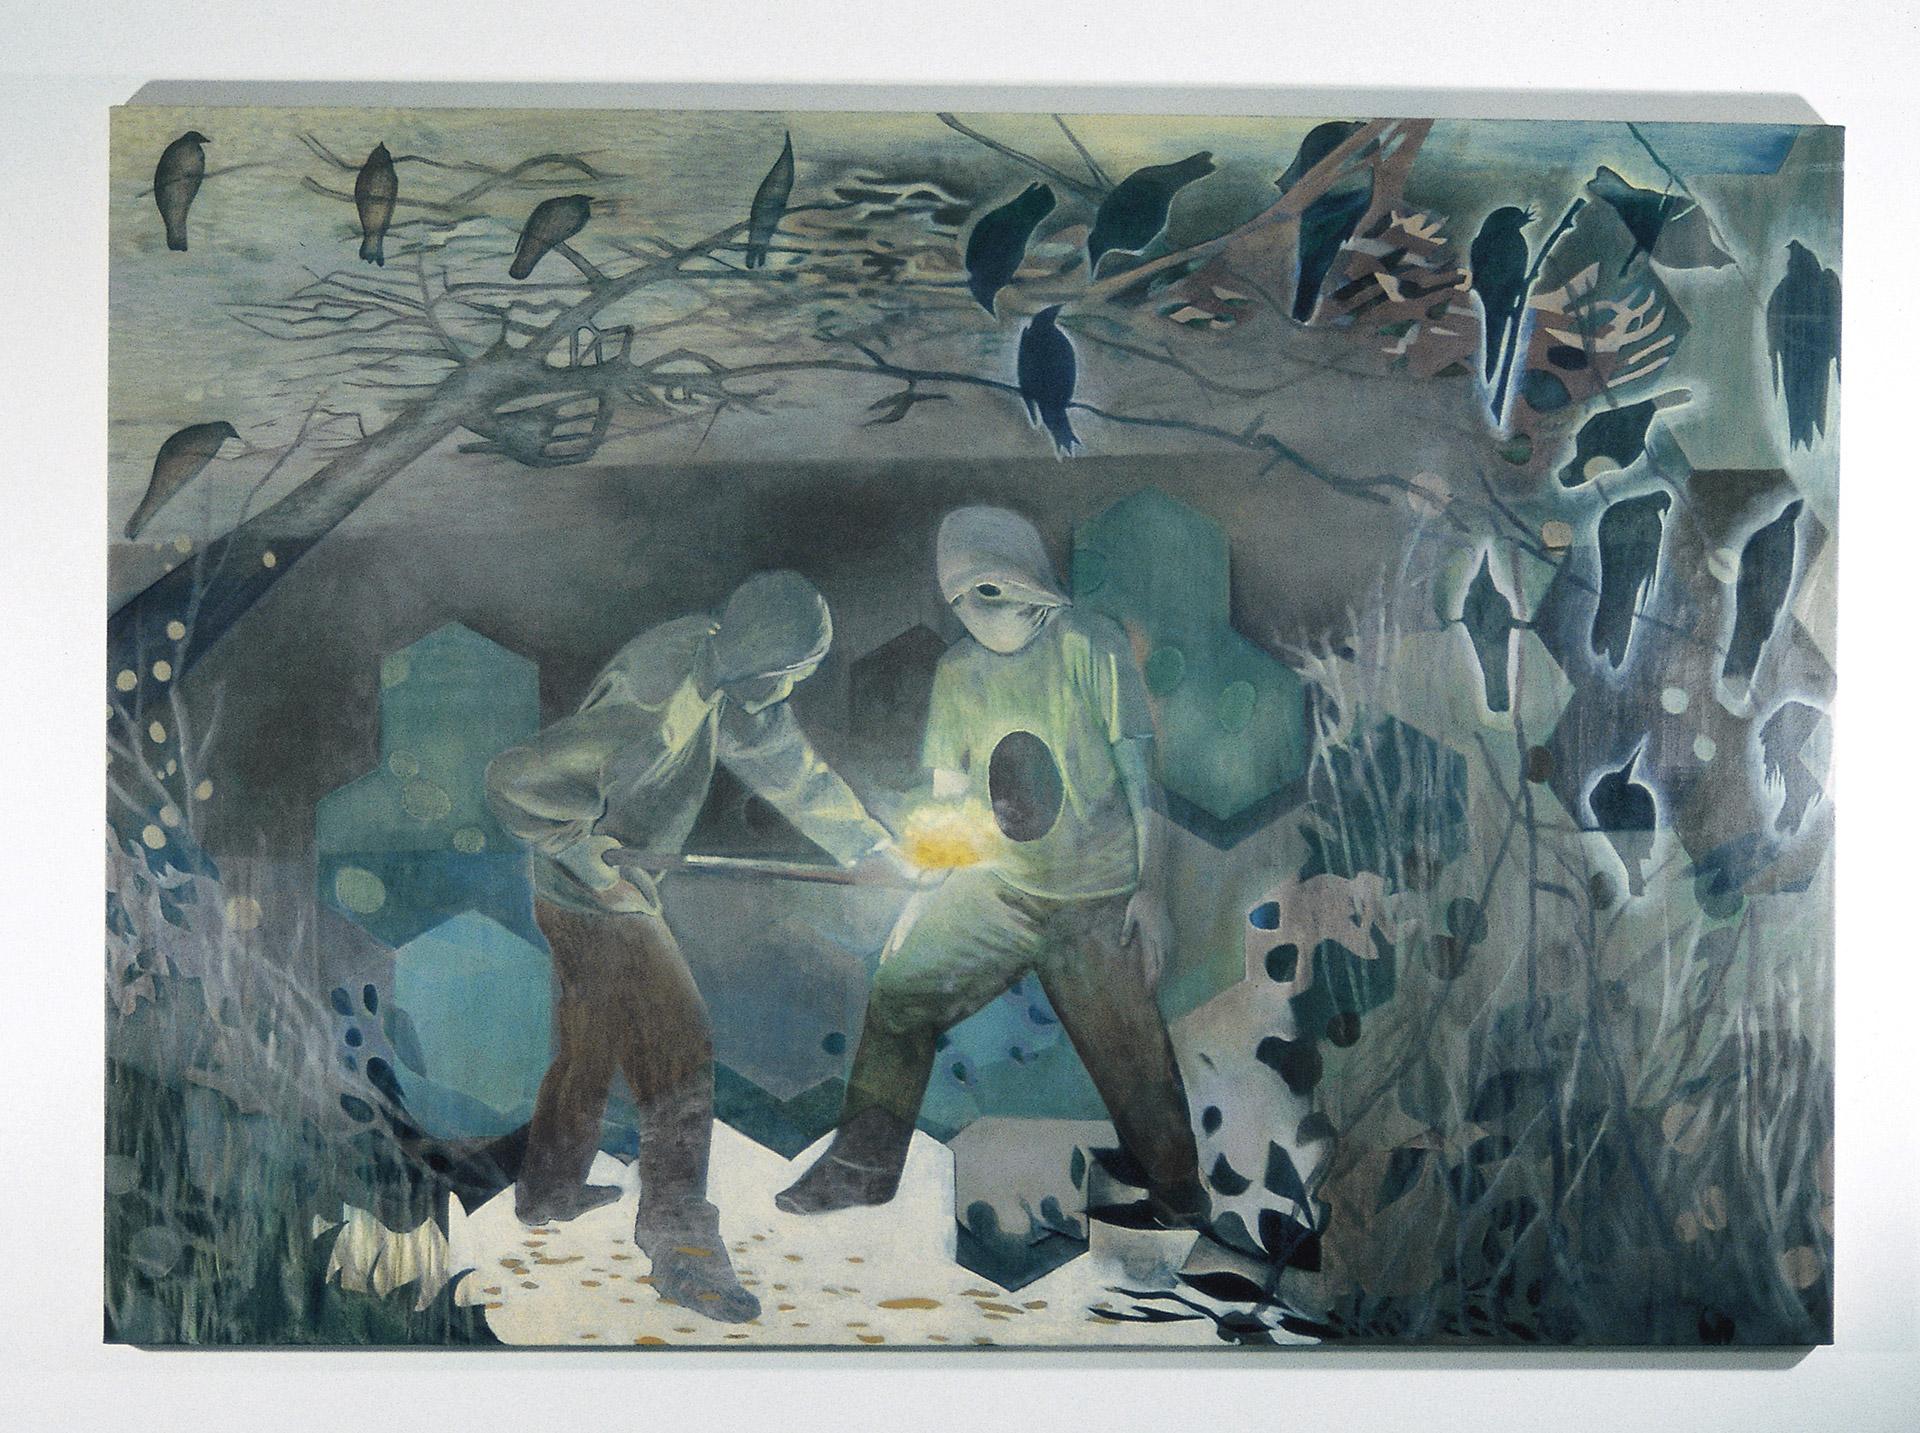 Coalface is a painting by Australian artist Madeleine Kelly Winner, Churchie Exhibition of Emerging Art, Judge: Dr Rex Butler